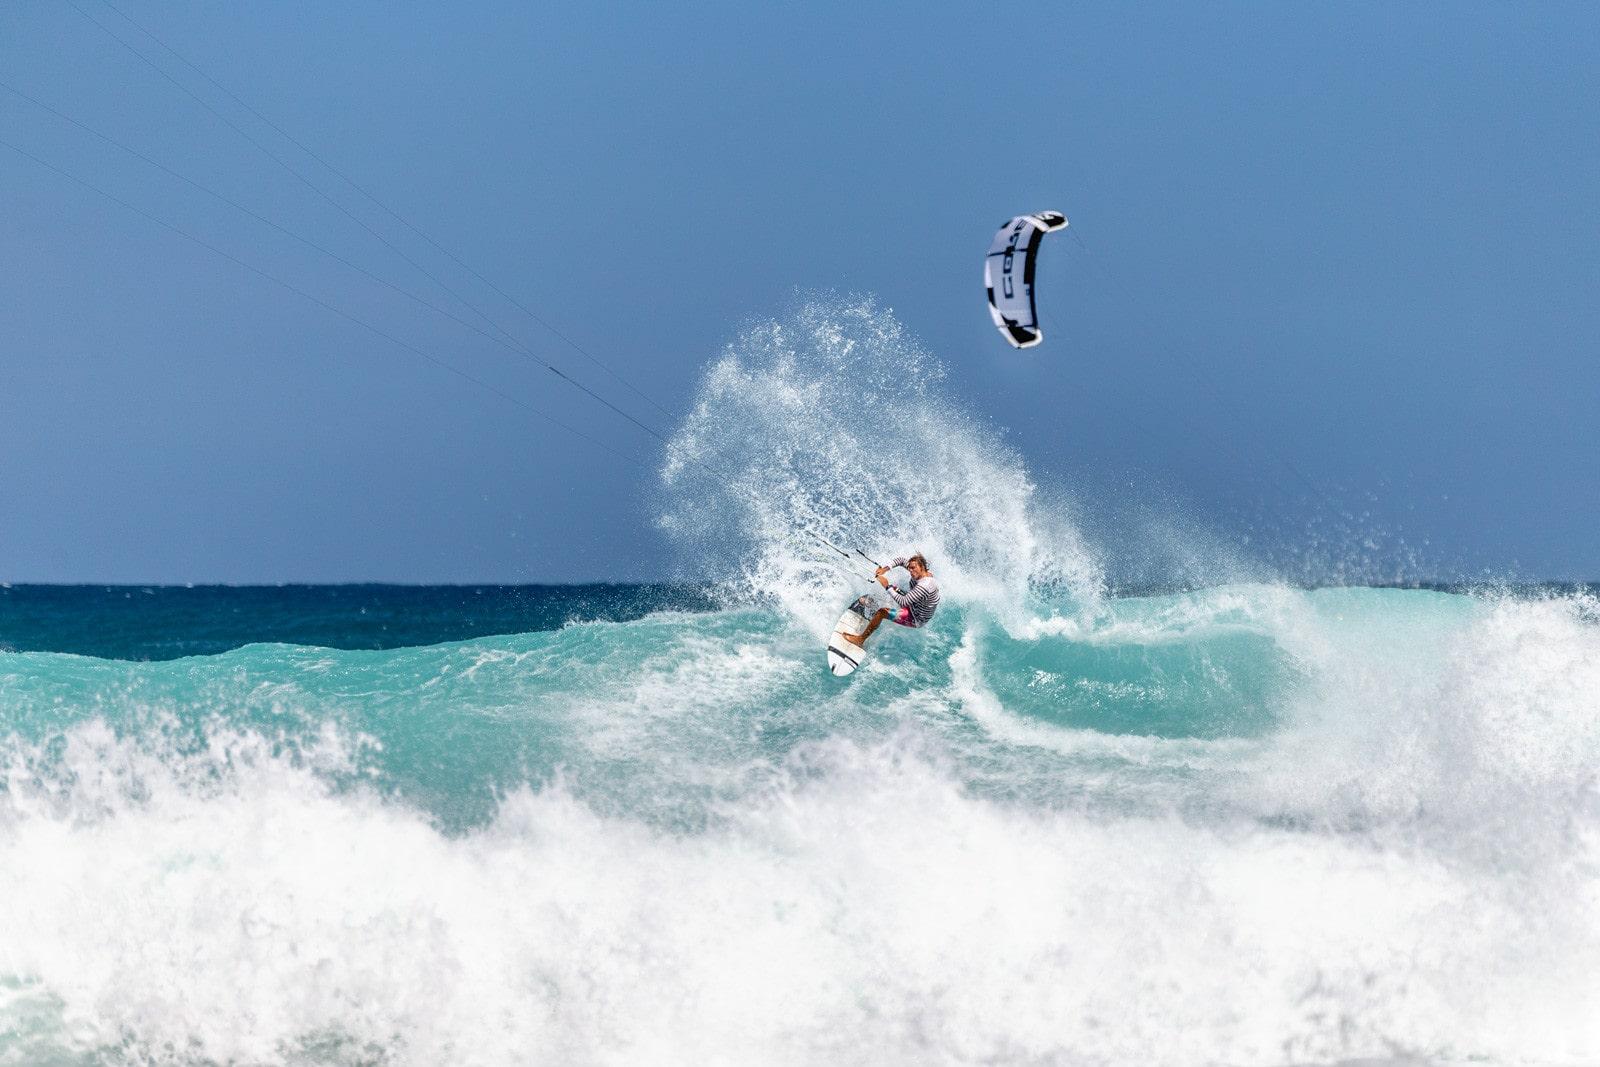 Core Ripper 4 Surfboard was ist neu?